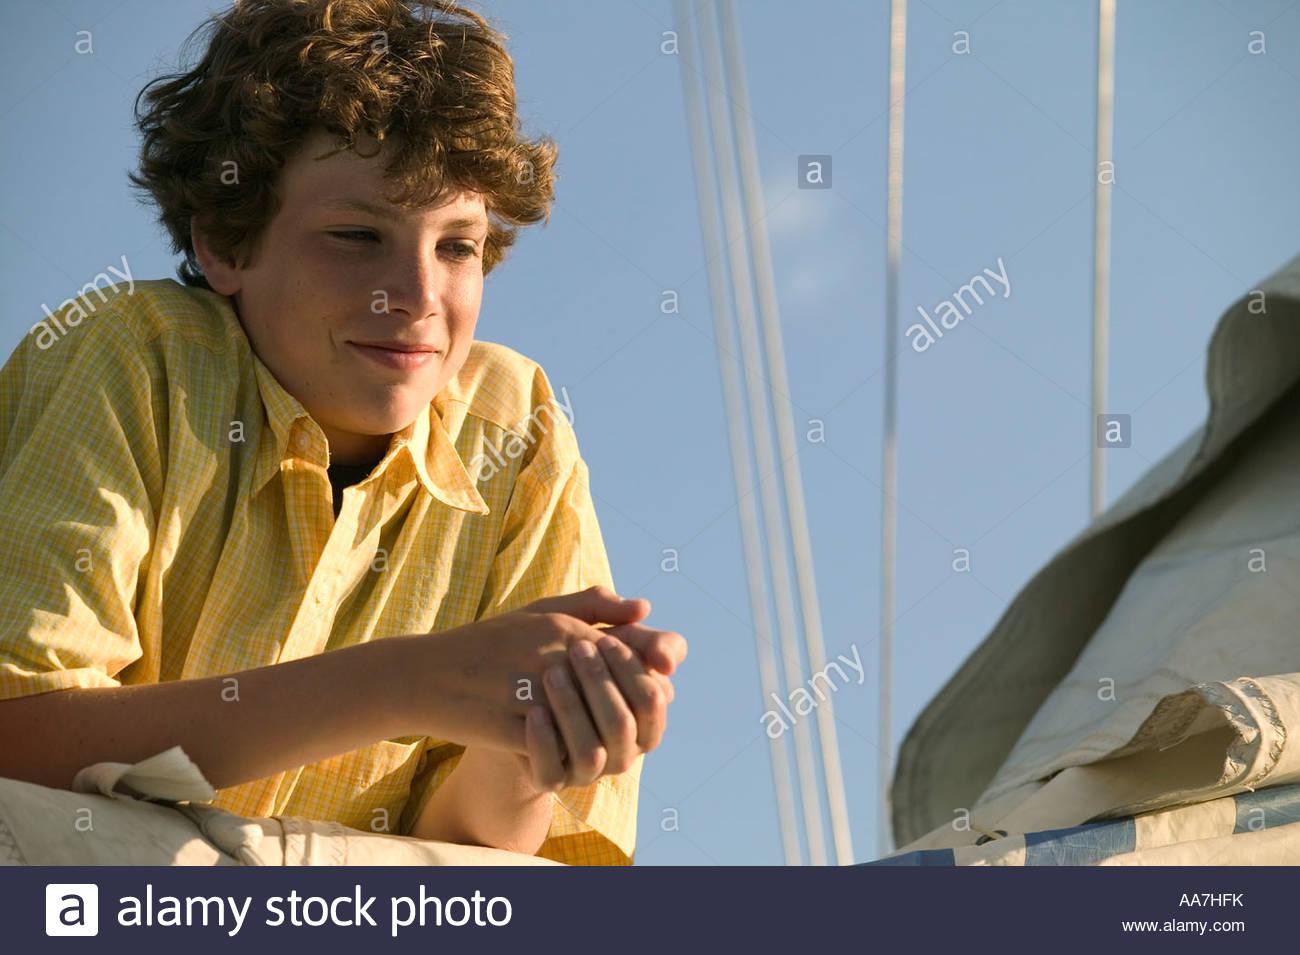 Teenage boy leaning on sail - Stock Image